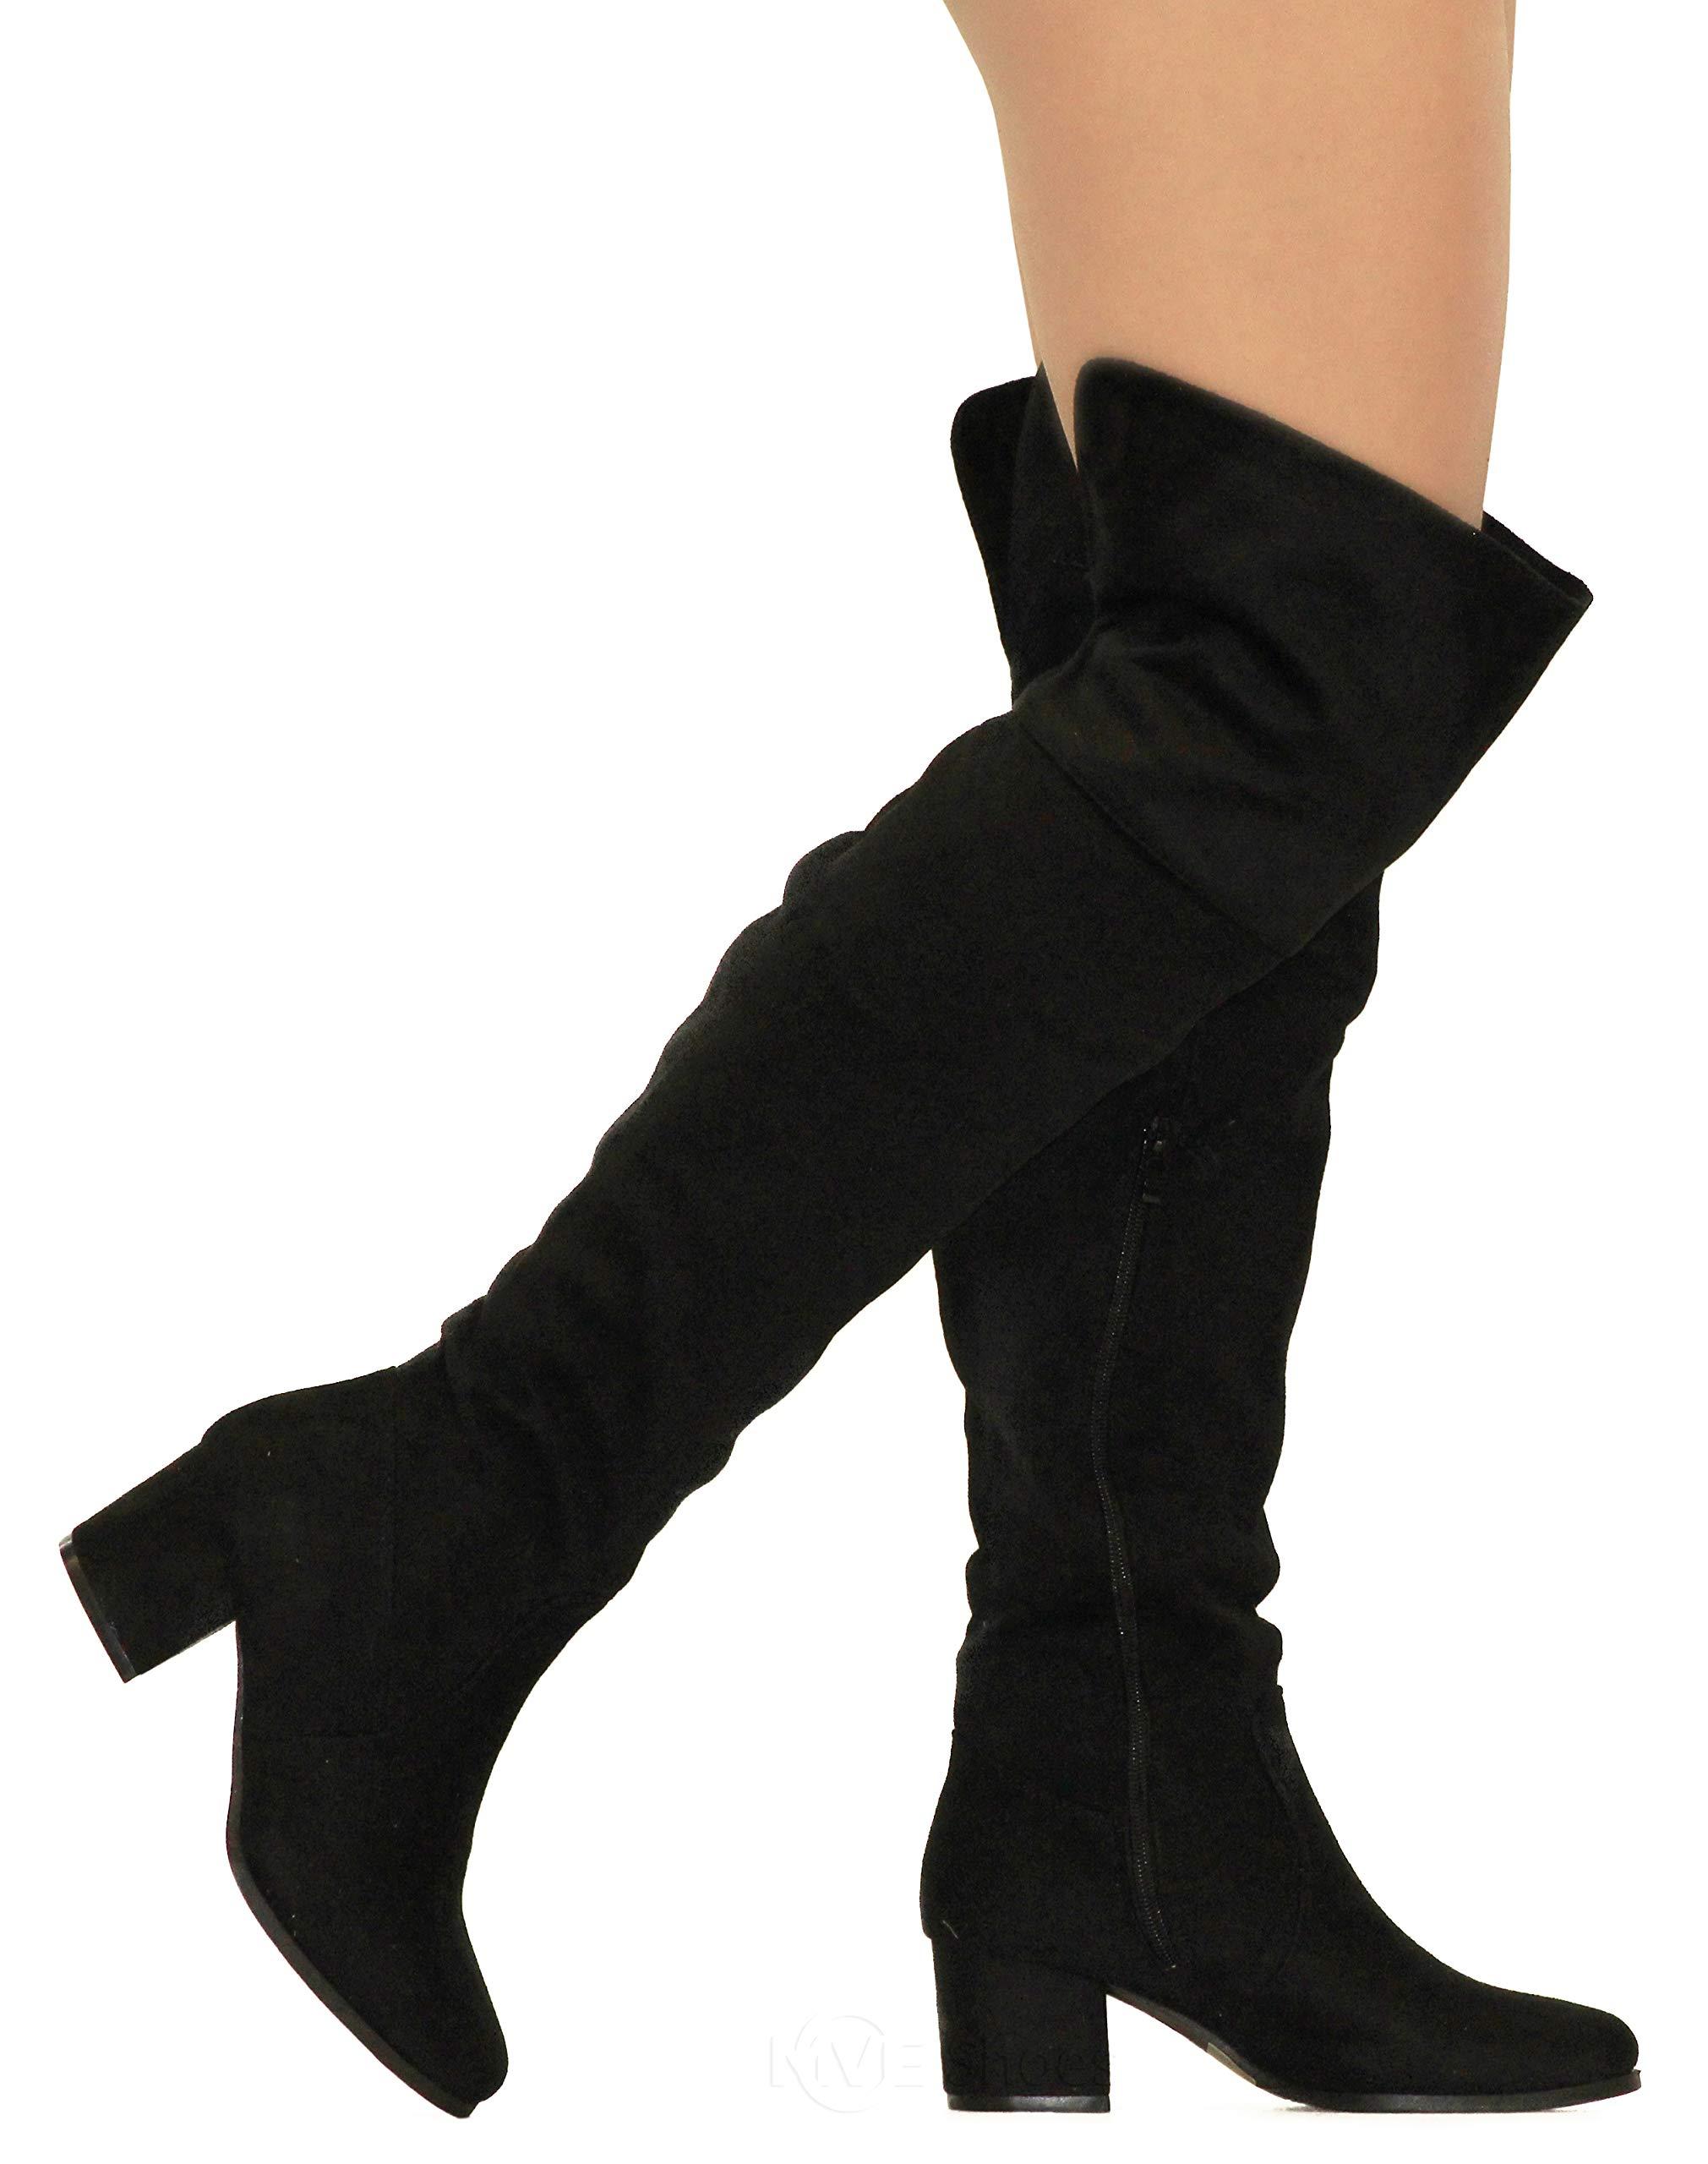 MVE Shoes Women's Over The Knee Stretch Boot - Trendy Low Block Heel Shoe - Sexy Over The Knee Pullon Boot - Comfortable Easy Heel Boot, Black Size 10